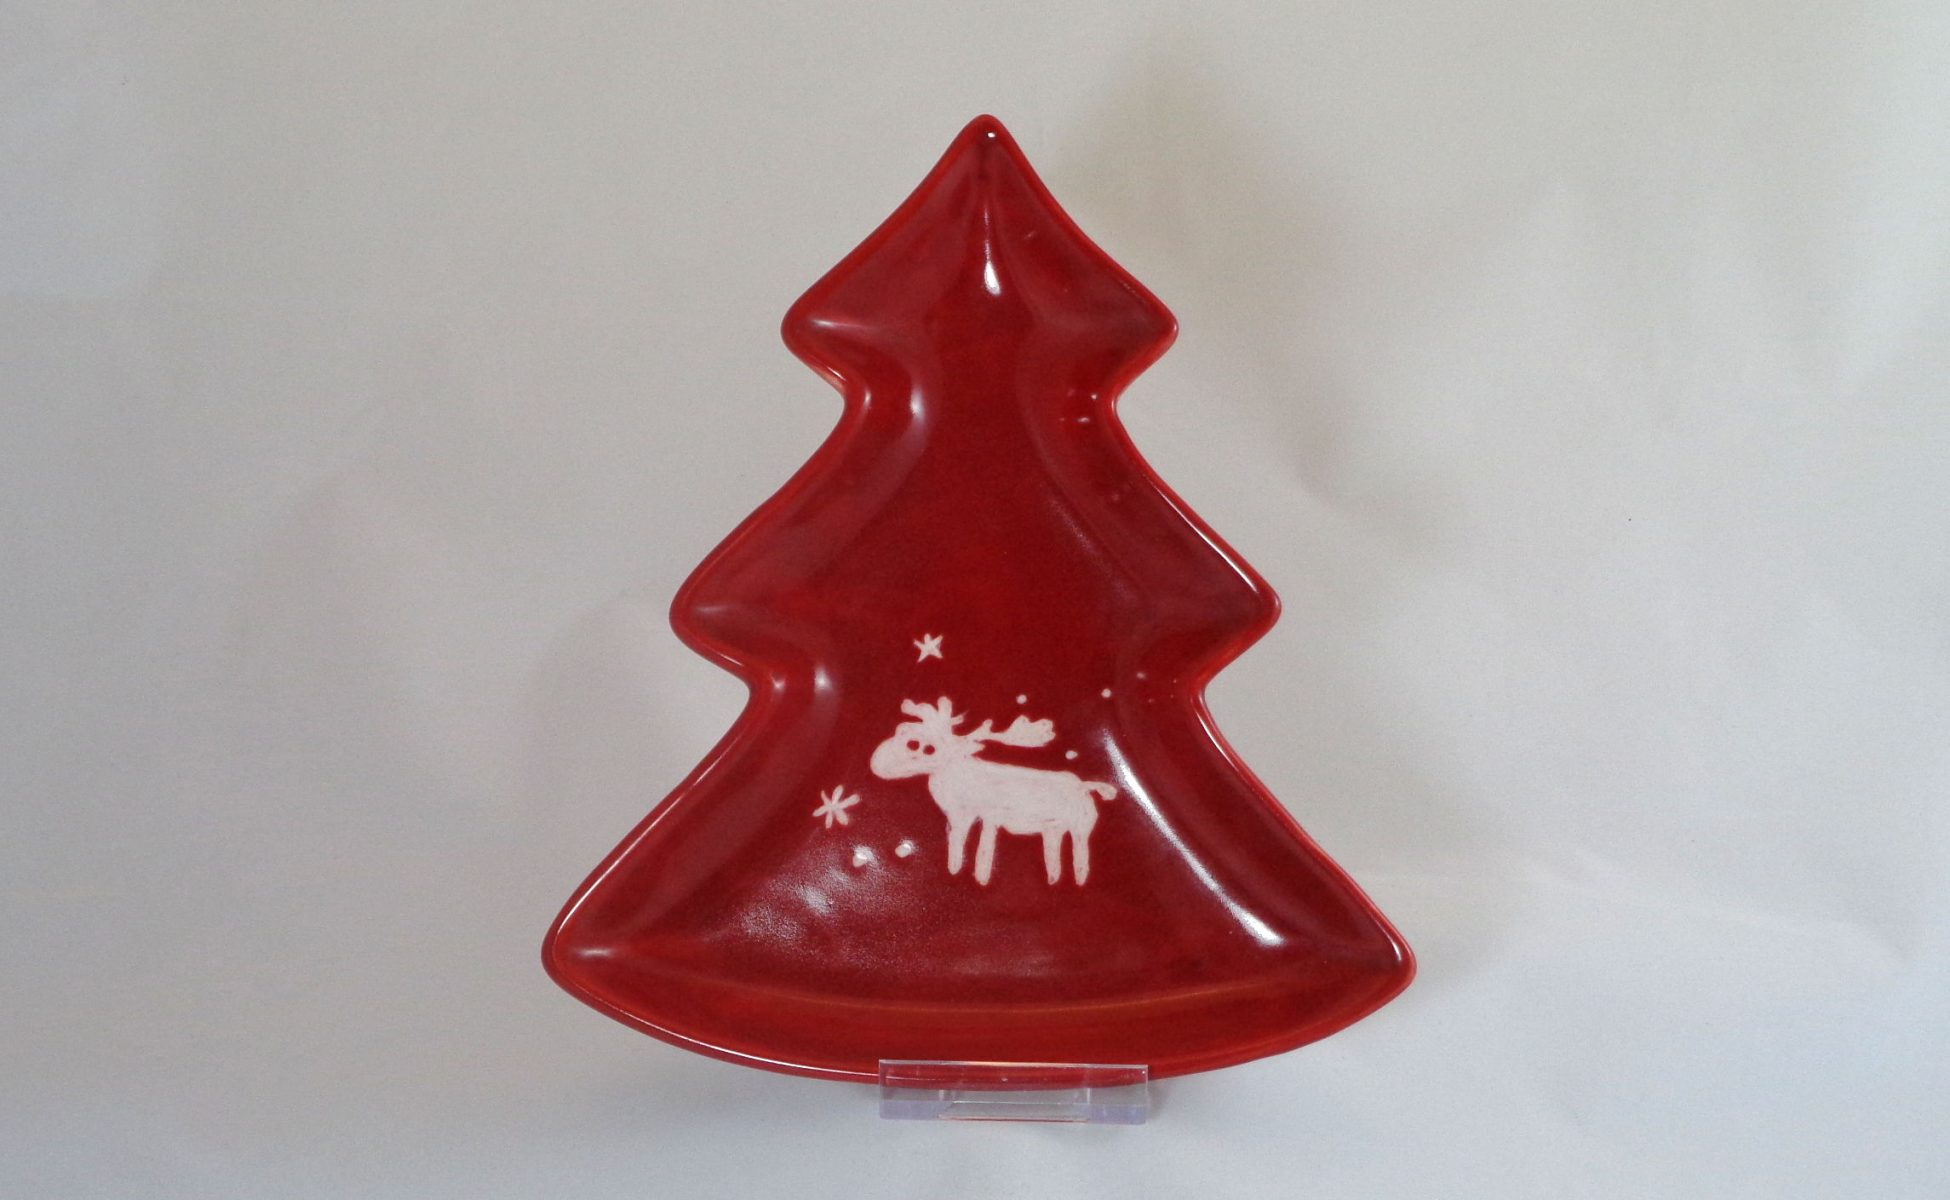 Bemalte Keramik Tannen-Teller Rentier